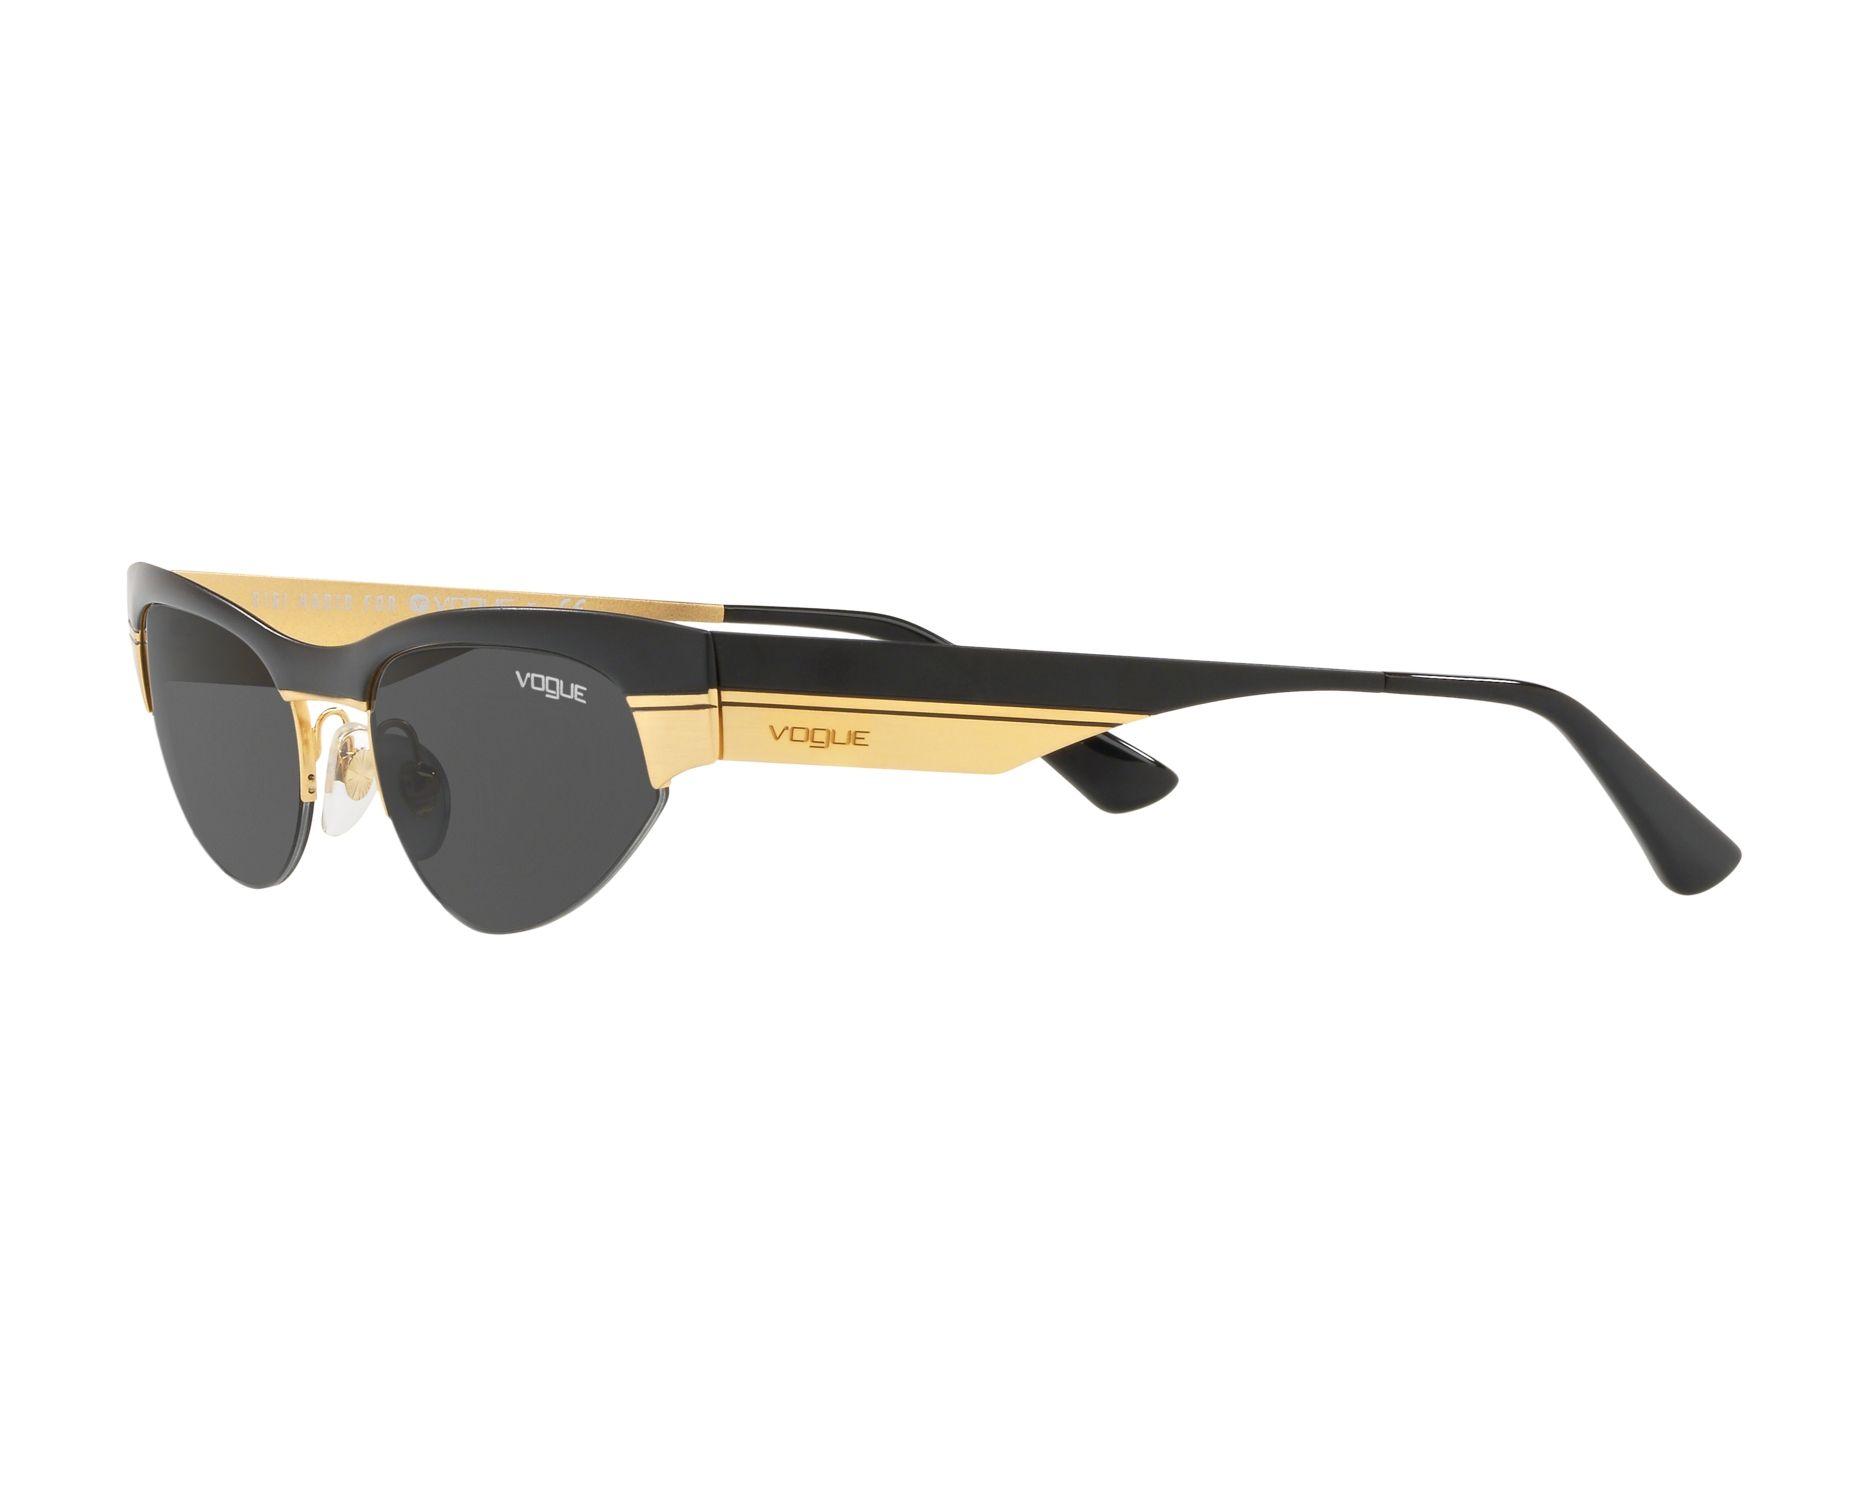 4838a76c76 Gafas de sol Vogue VO-4105-S 917-87 - Negra Oro Vista